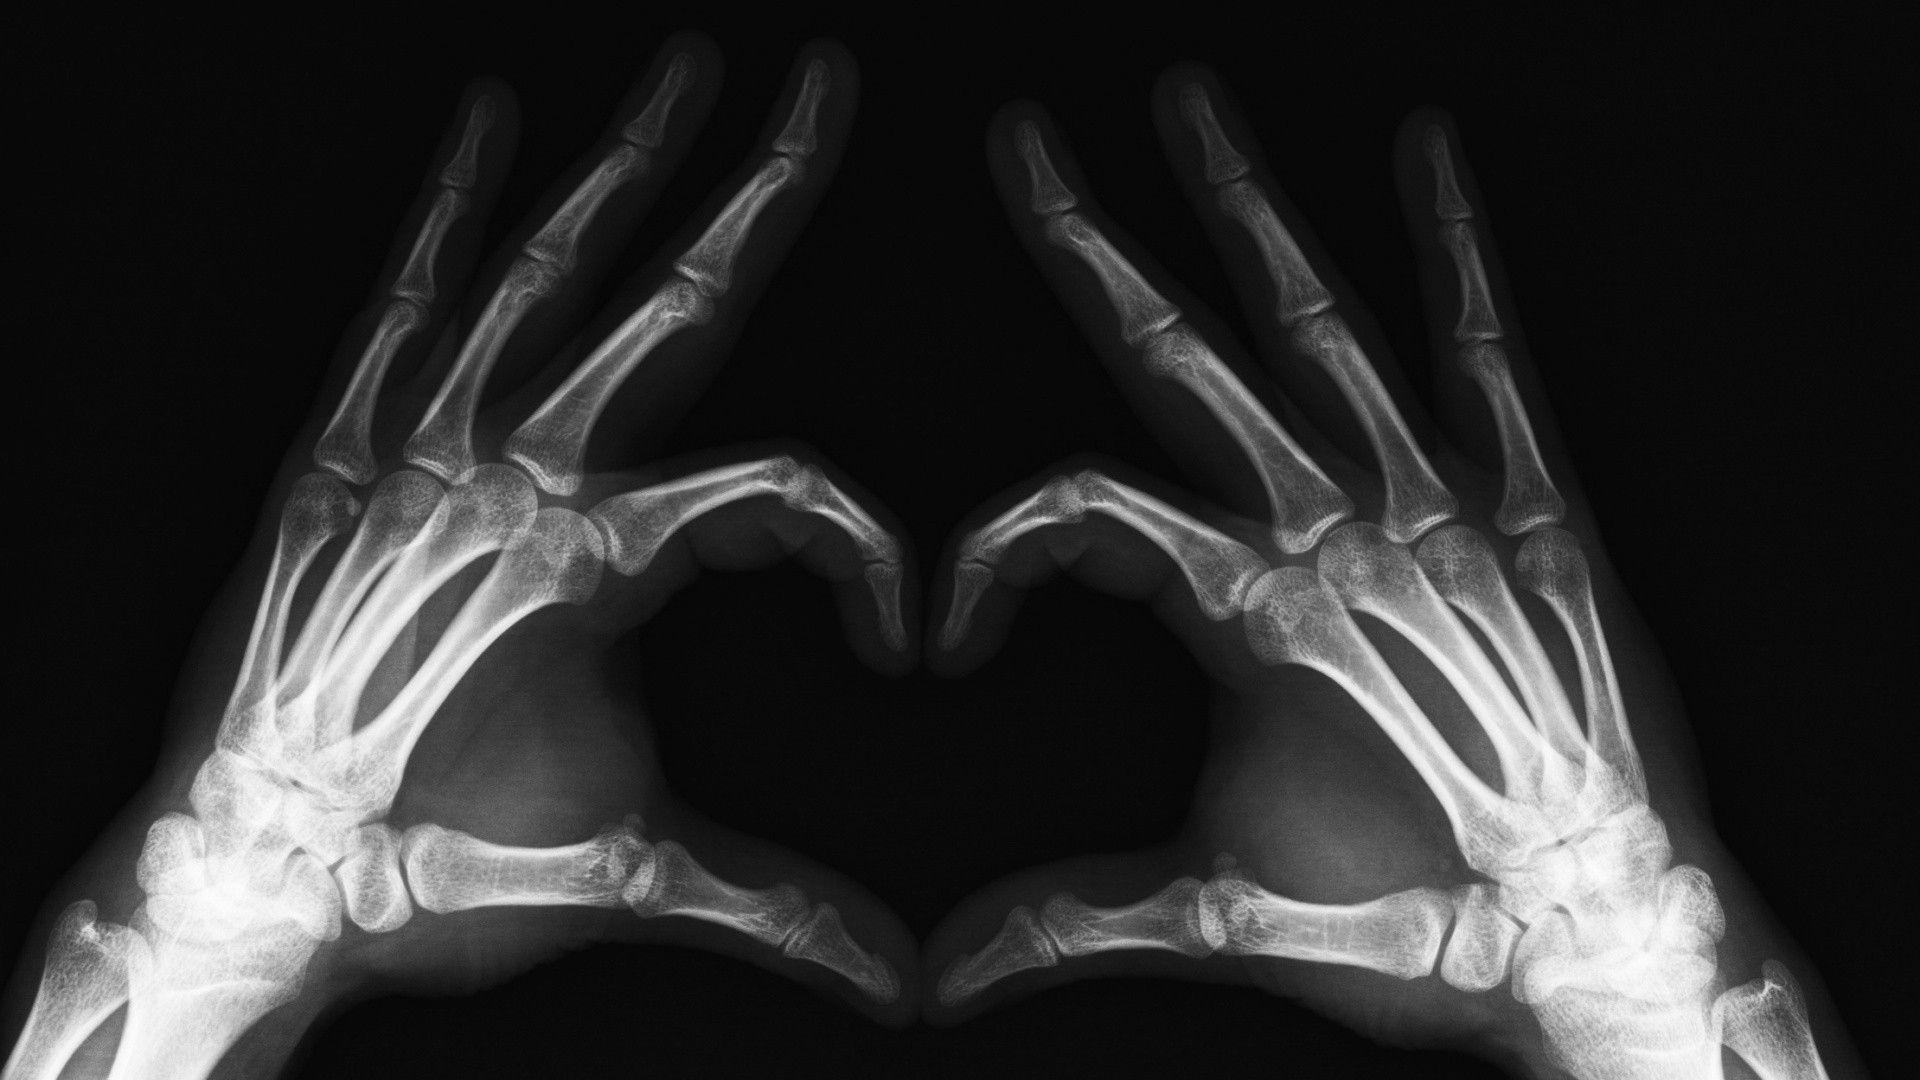 1920x1080 hands x ray wallpaper